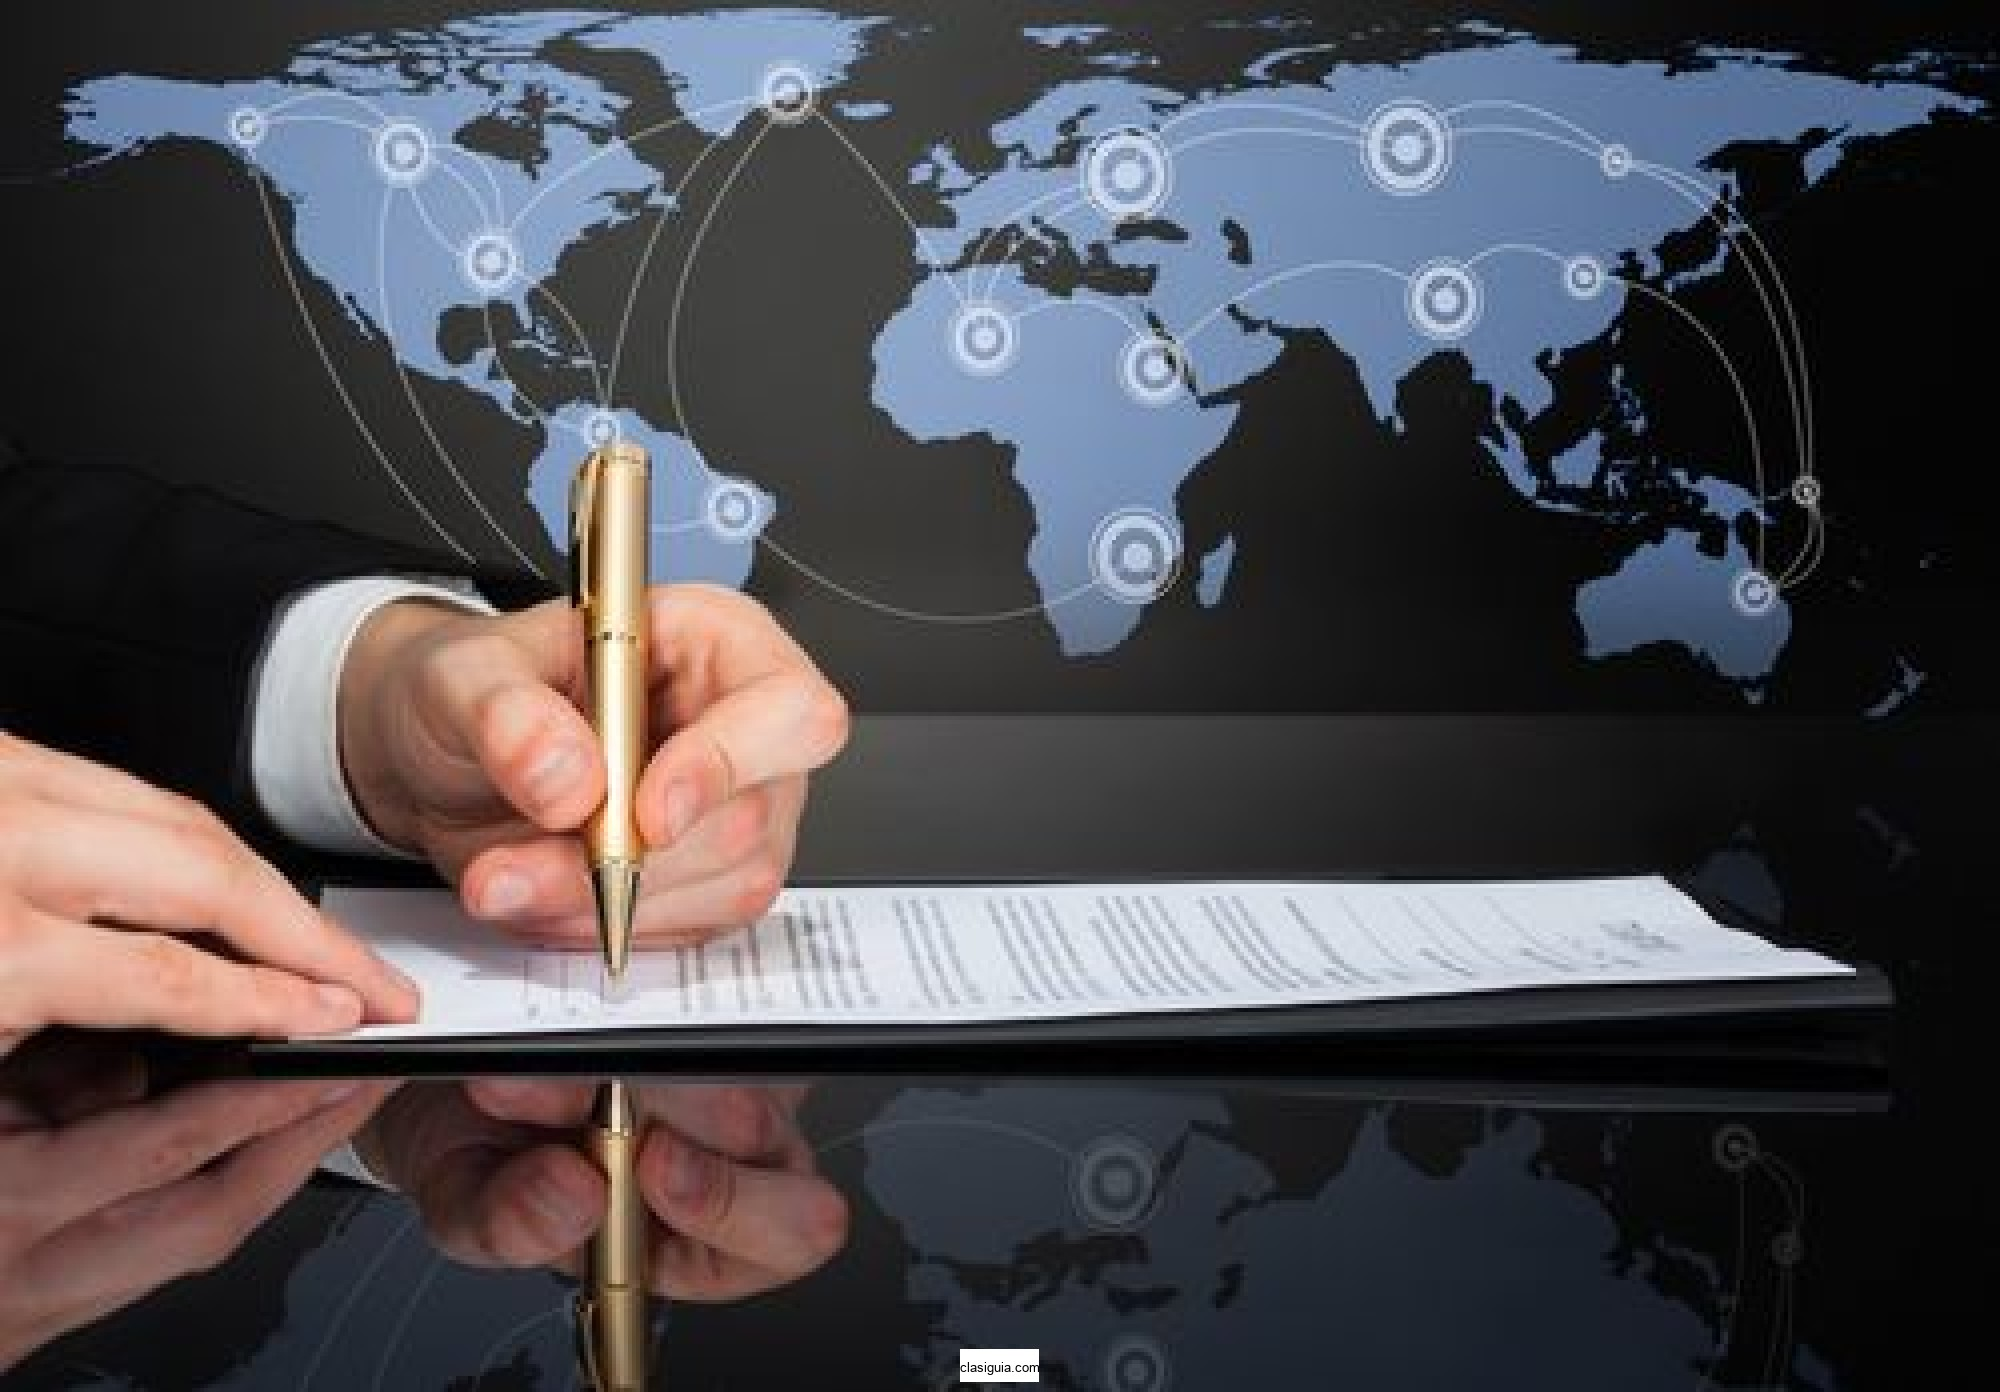 Servicios Profesionales de Notario. Public Notary Services.